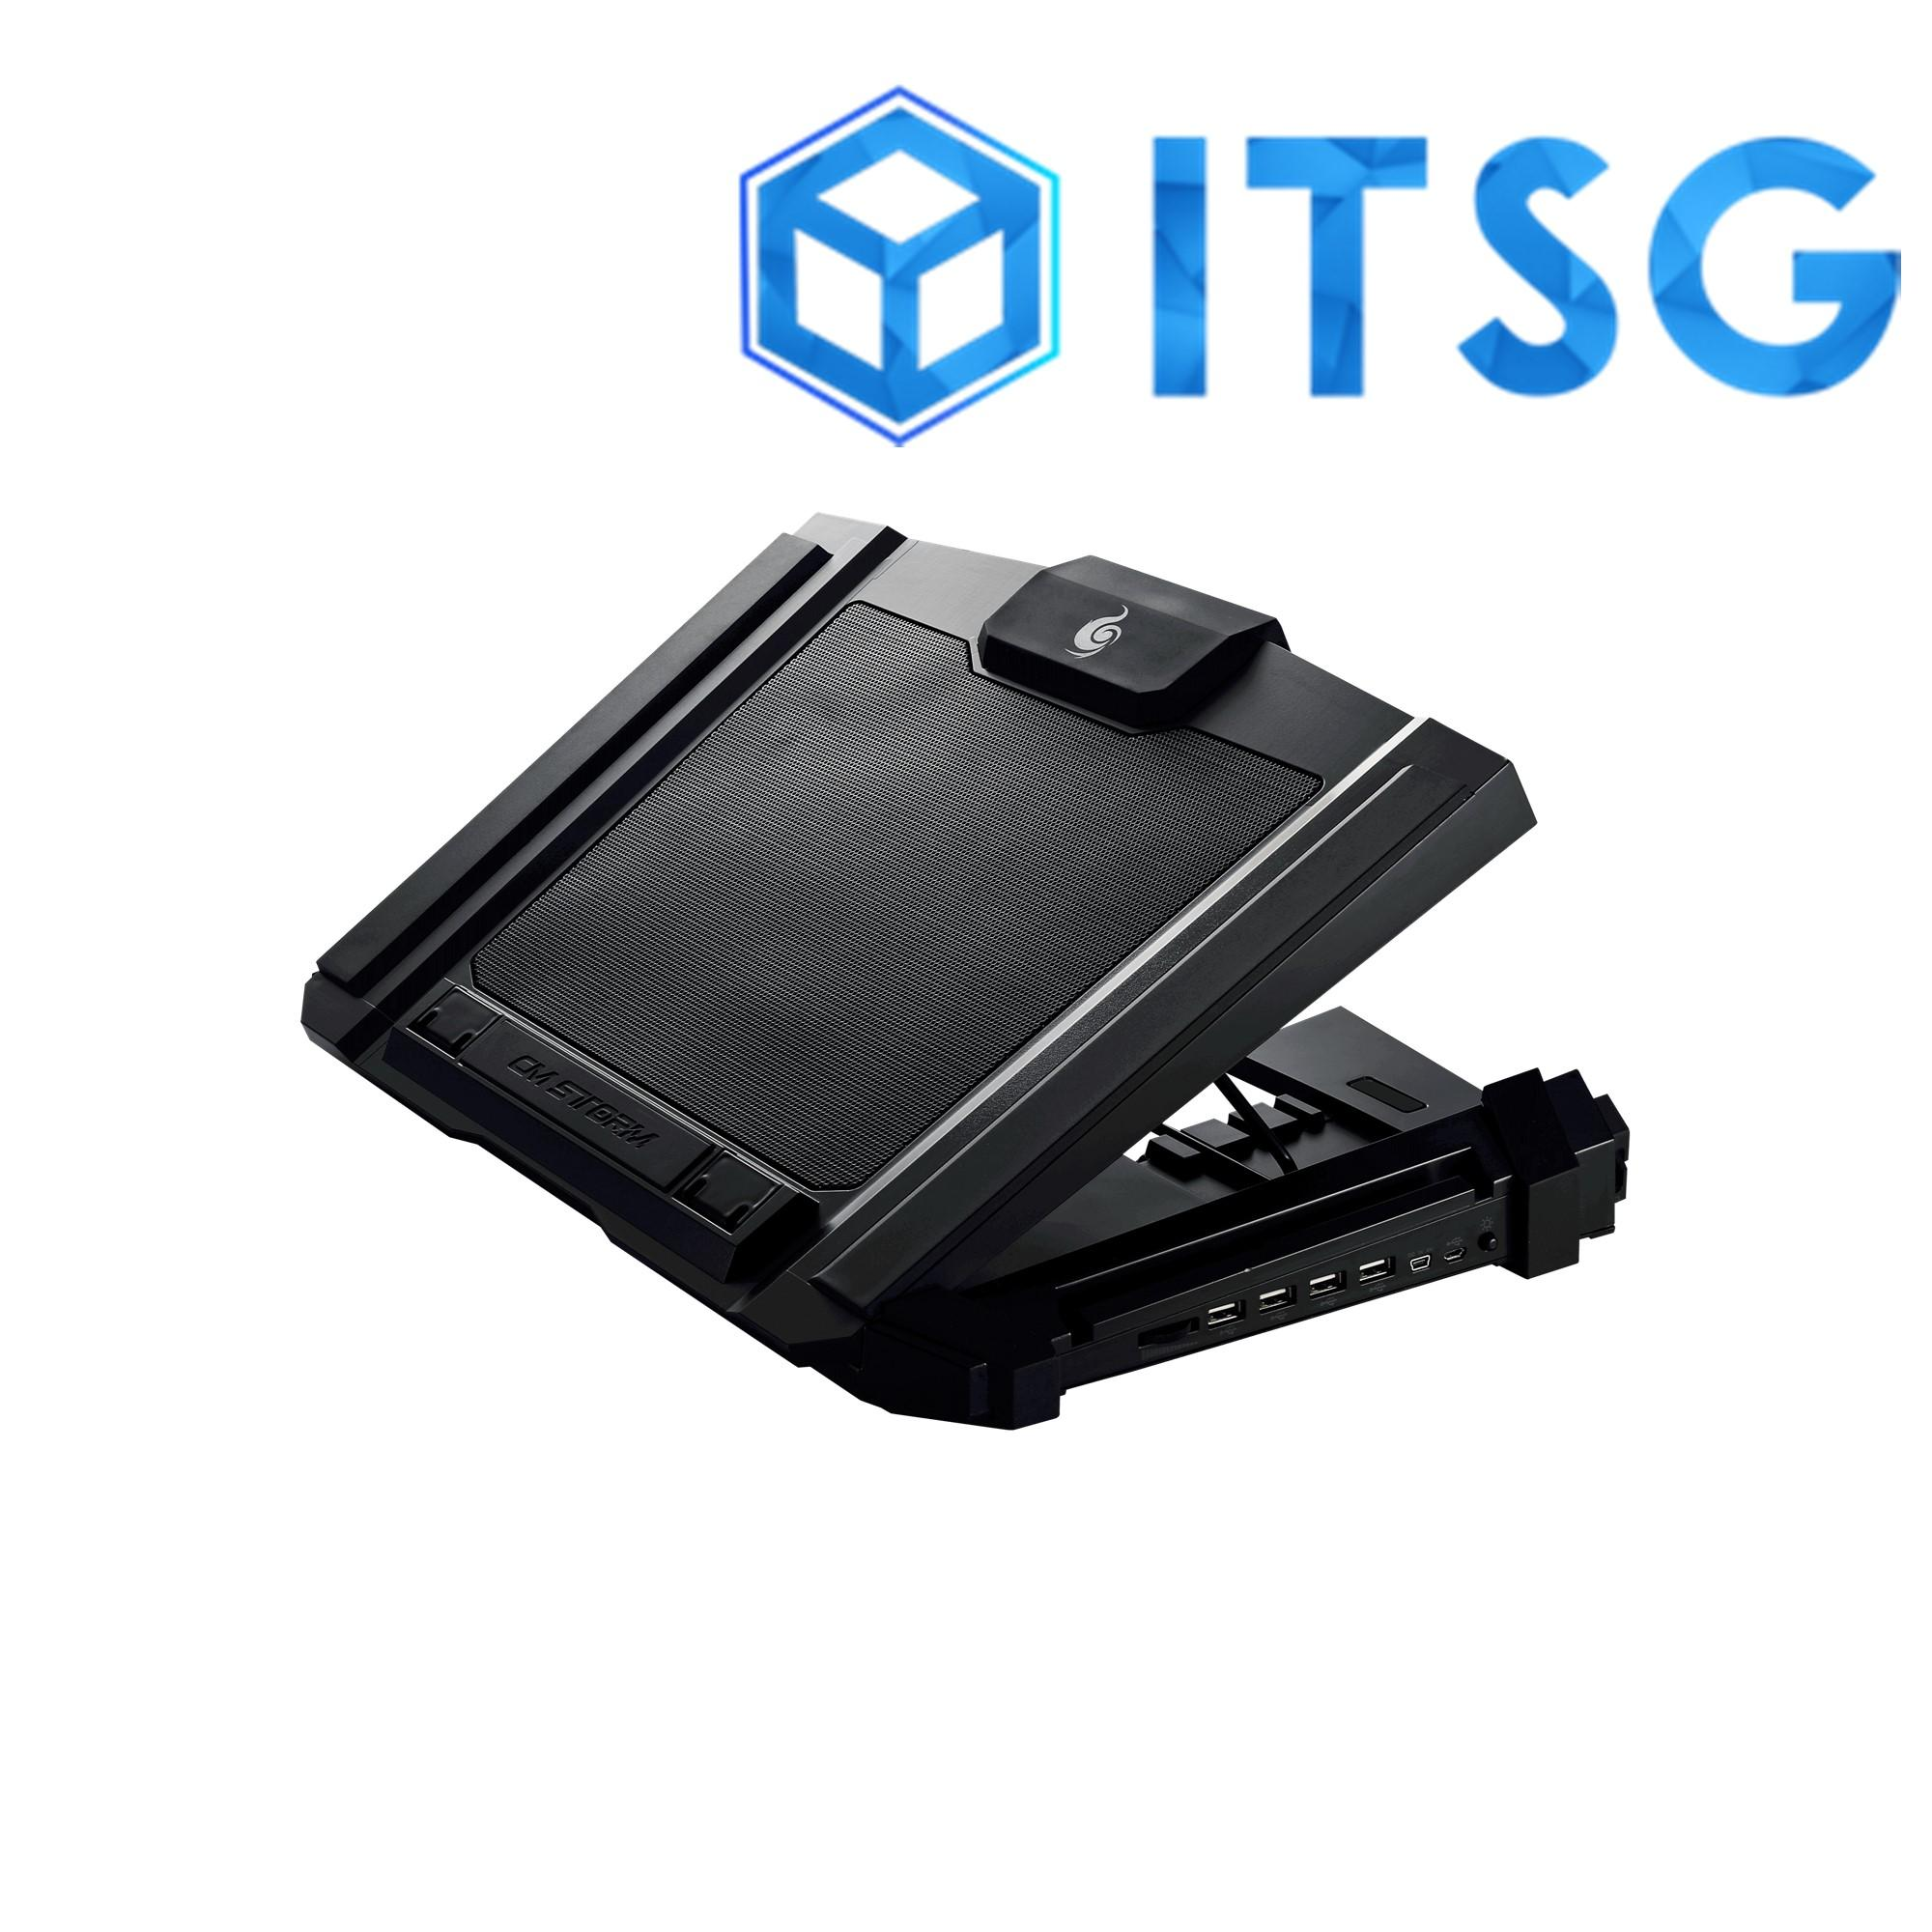 Cooler Master SF-17 180mm Fan Gaming Notebook Cooler